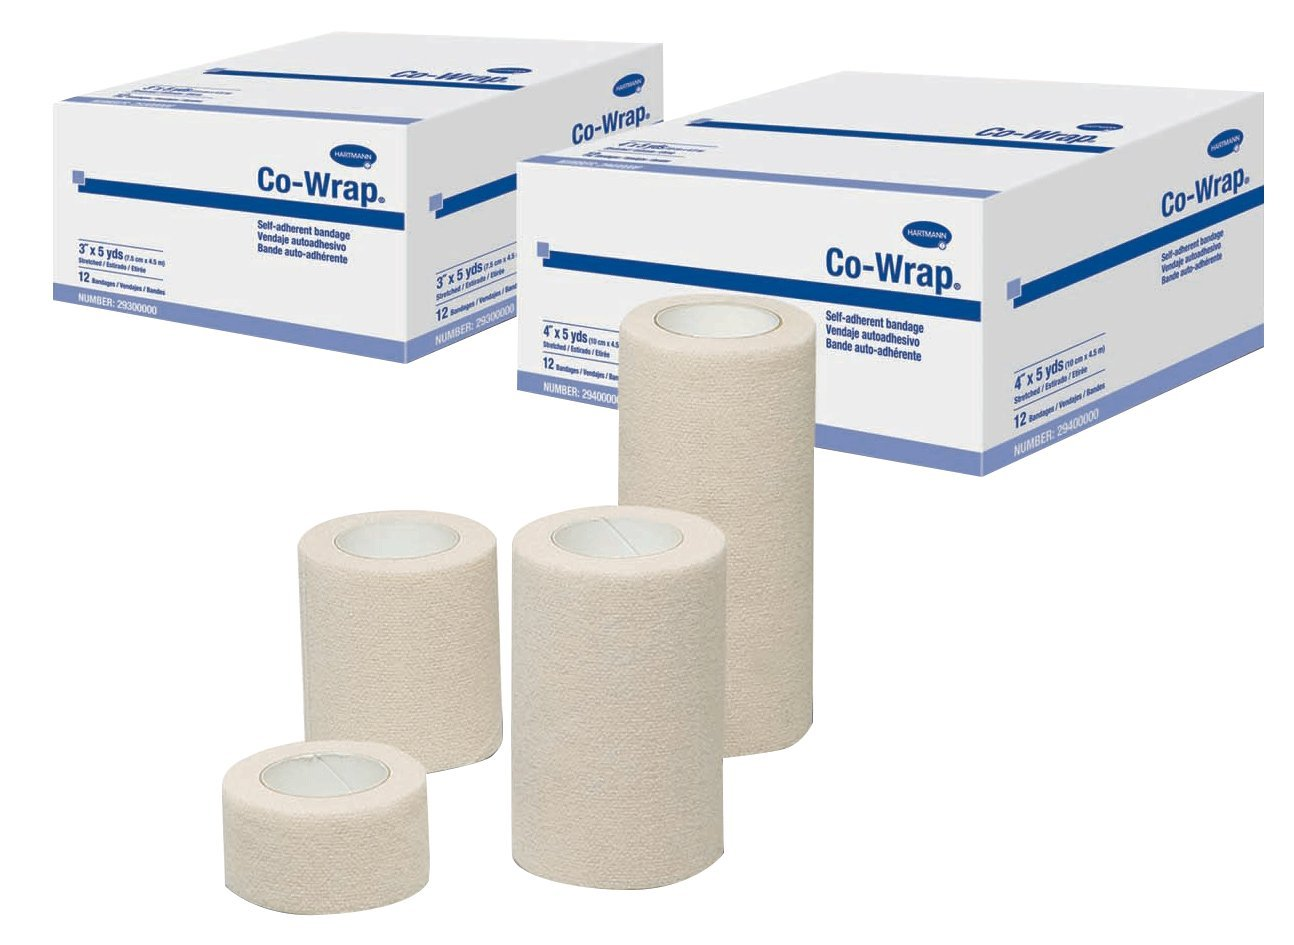 Hartmann 29300000 Co-Wrap Self-Adherent Bandage, 3'' Width, 5 yd. Length (Pack of 12)